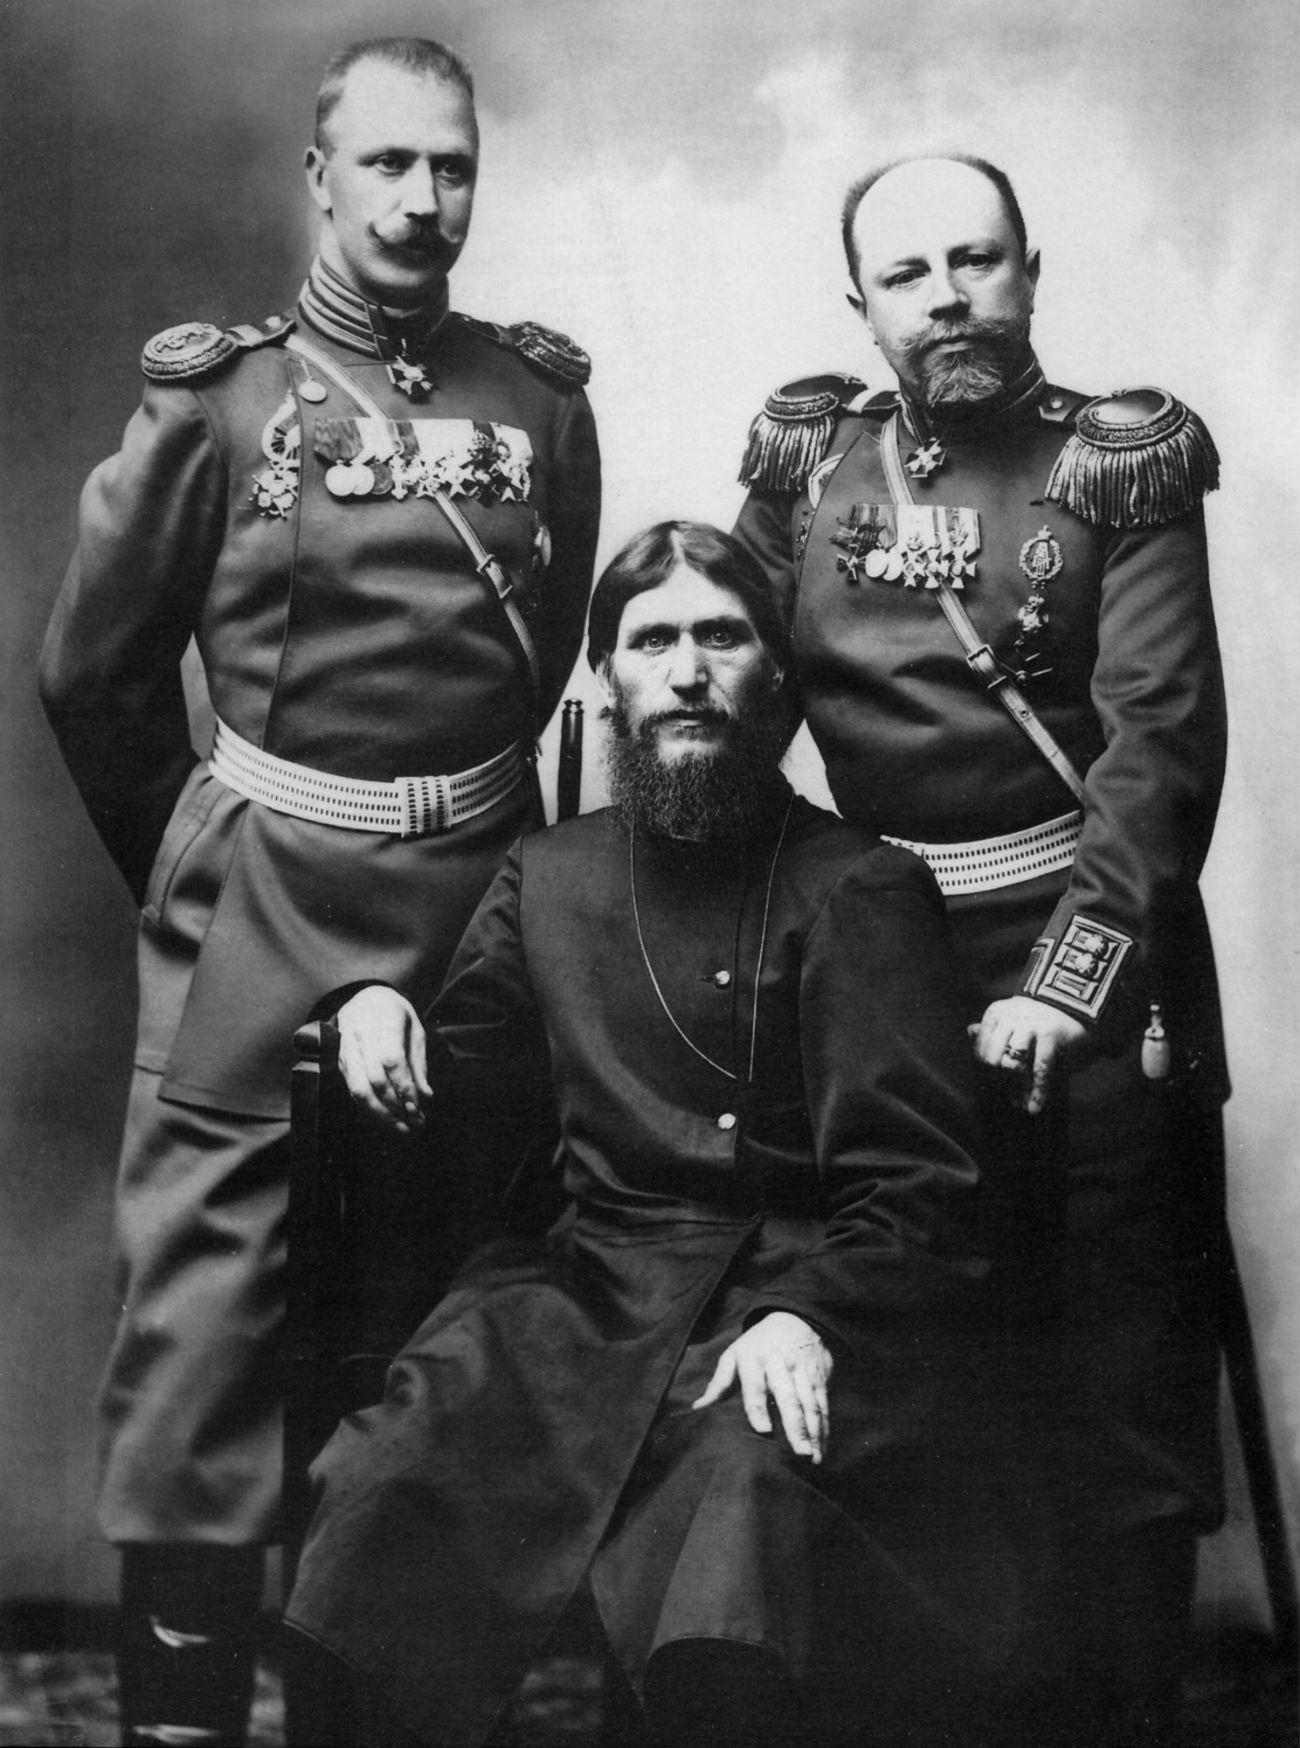 Dari kiri ke kanan: Kolonel Loman, Grigory Rasputin, Jenderal Putyatin.